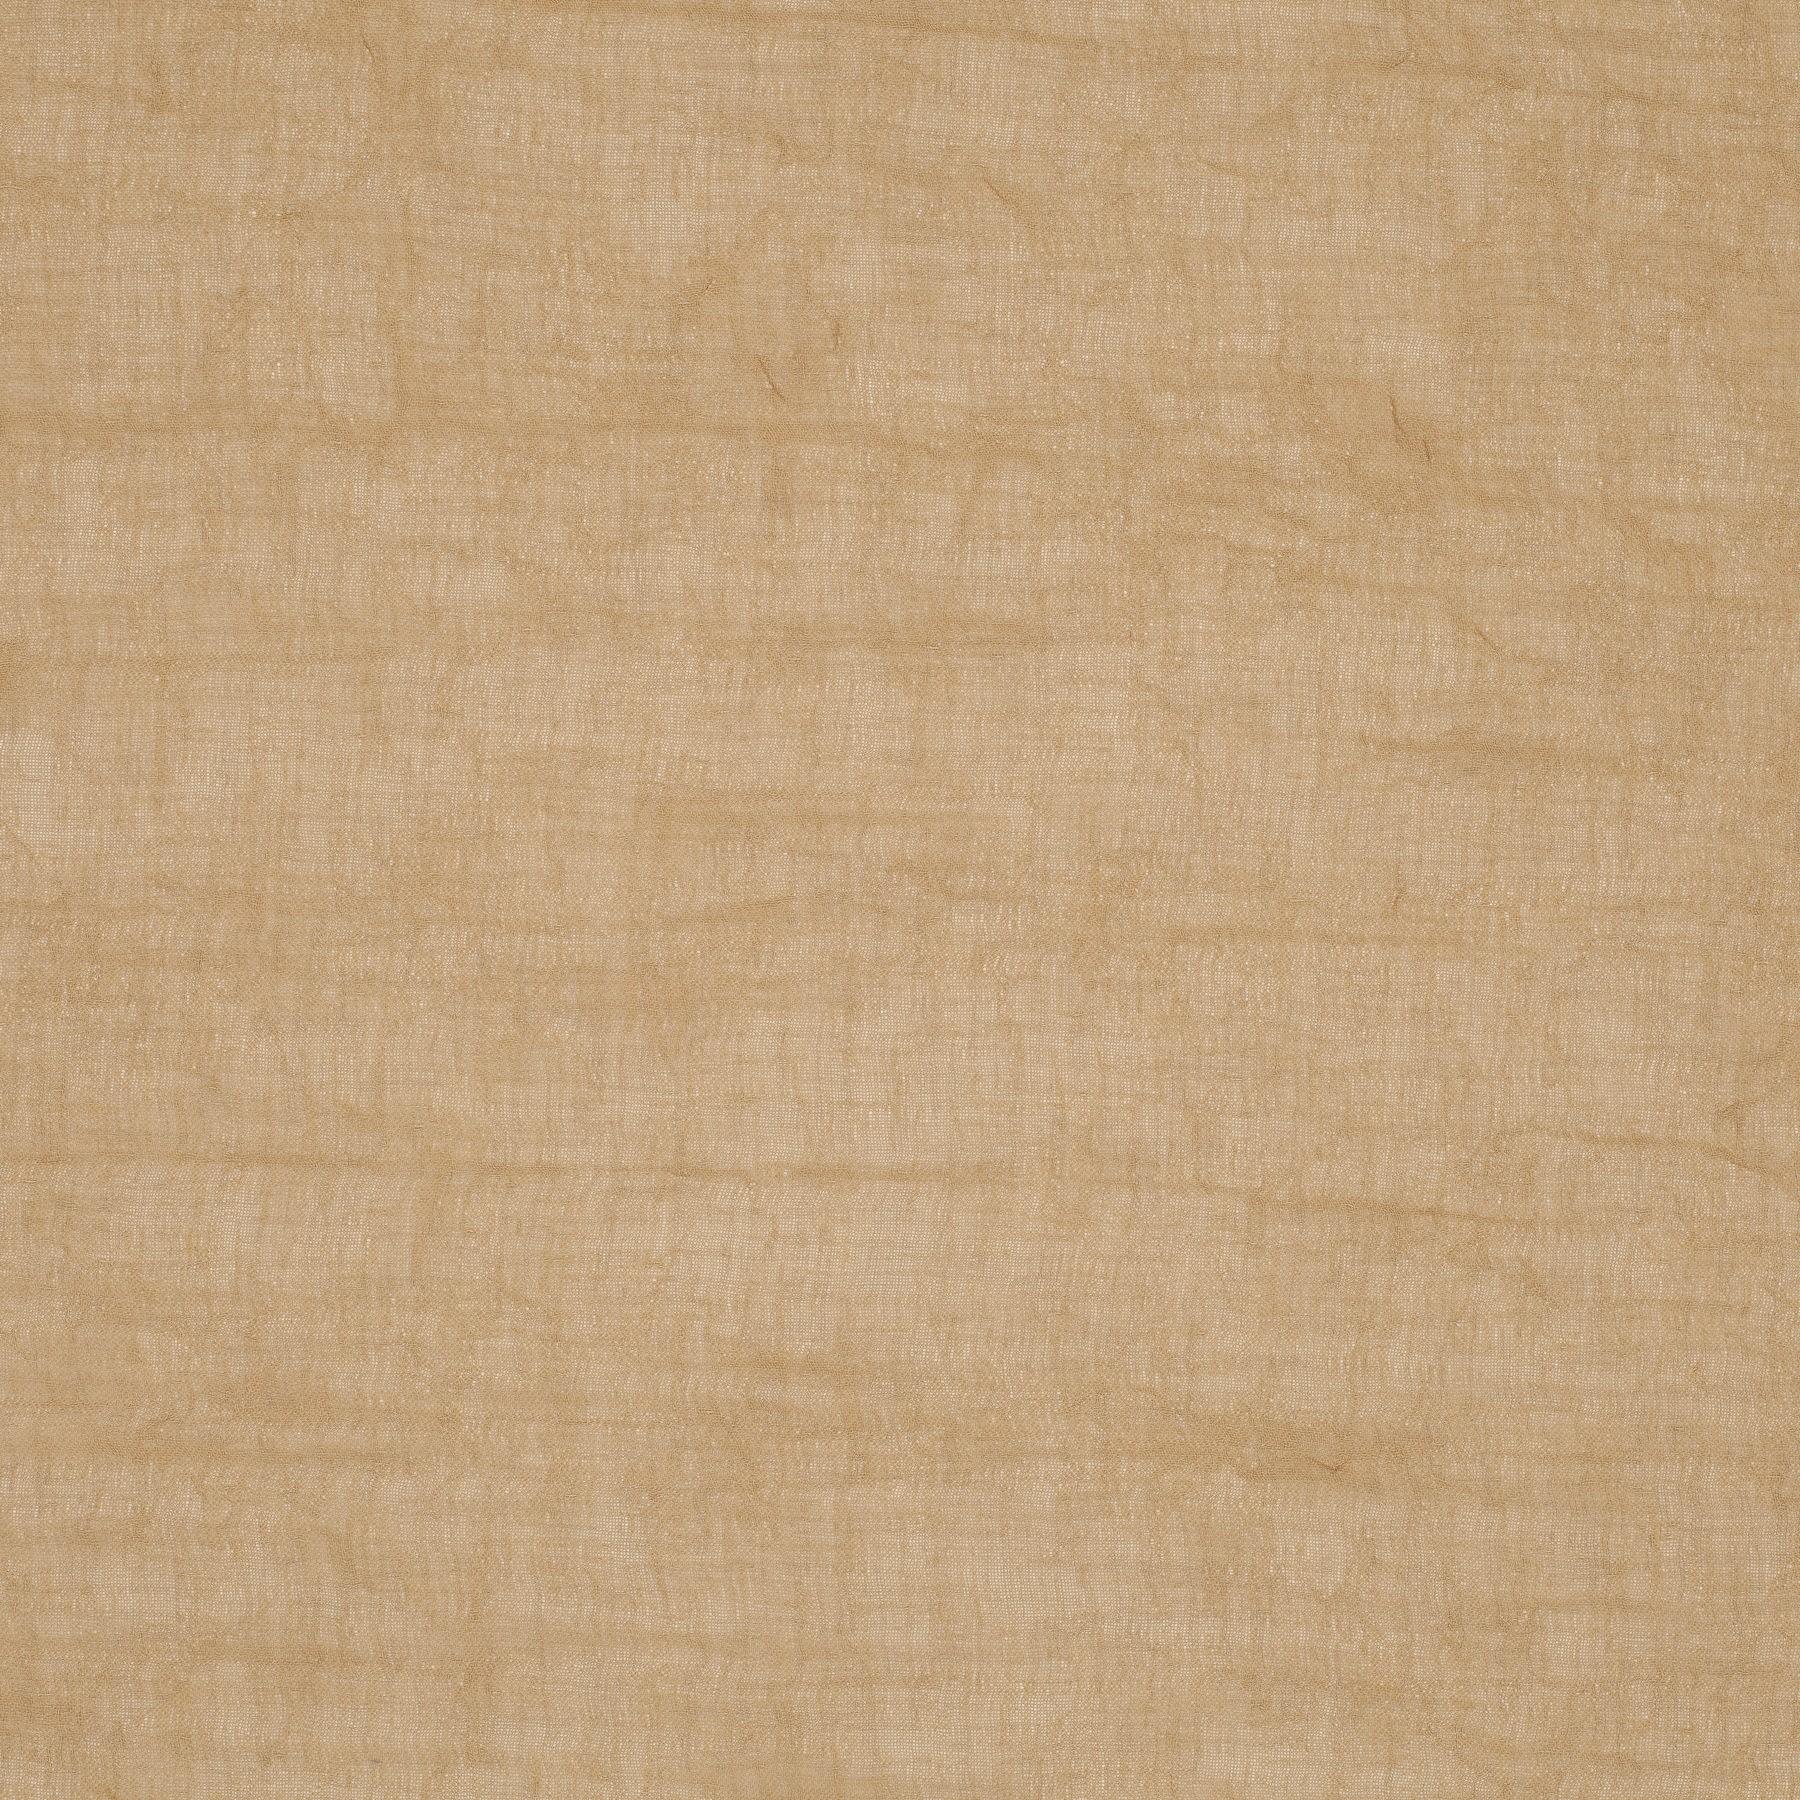 sheers aran 1 6814 060 jab anstoetz fabrics. Black Bedroom Furniture Sets. Home Design Ideas